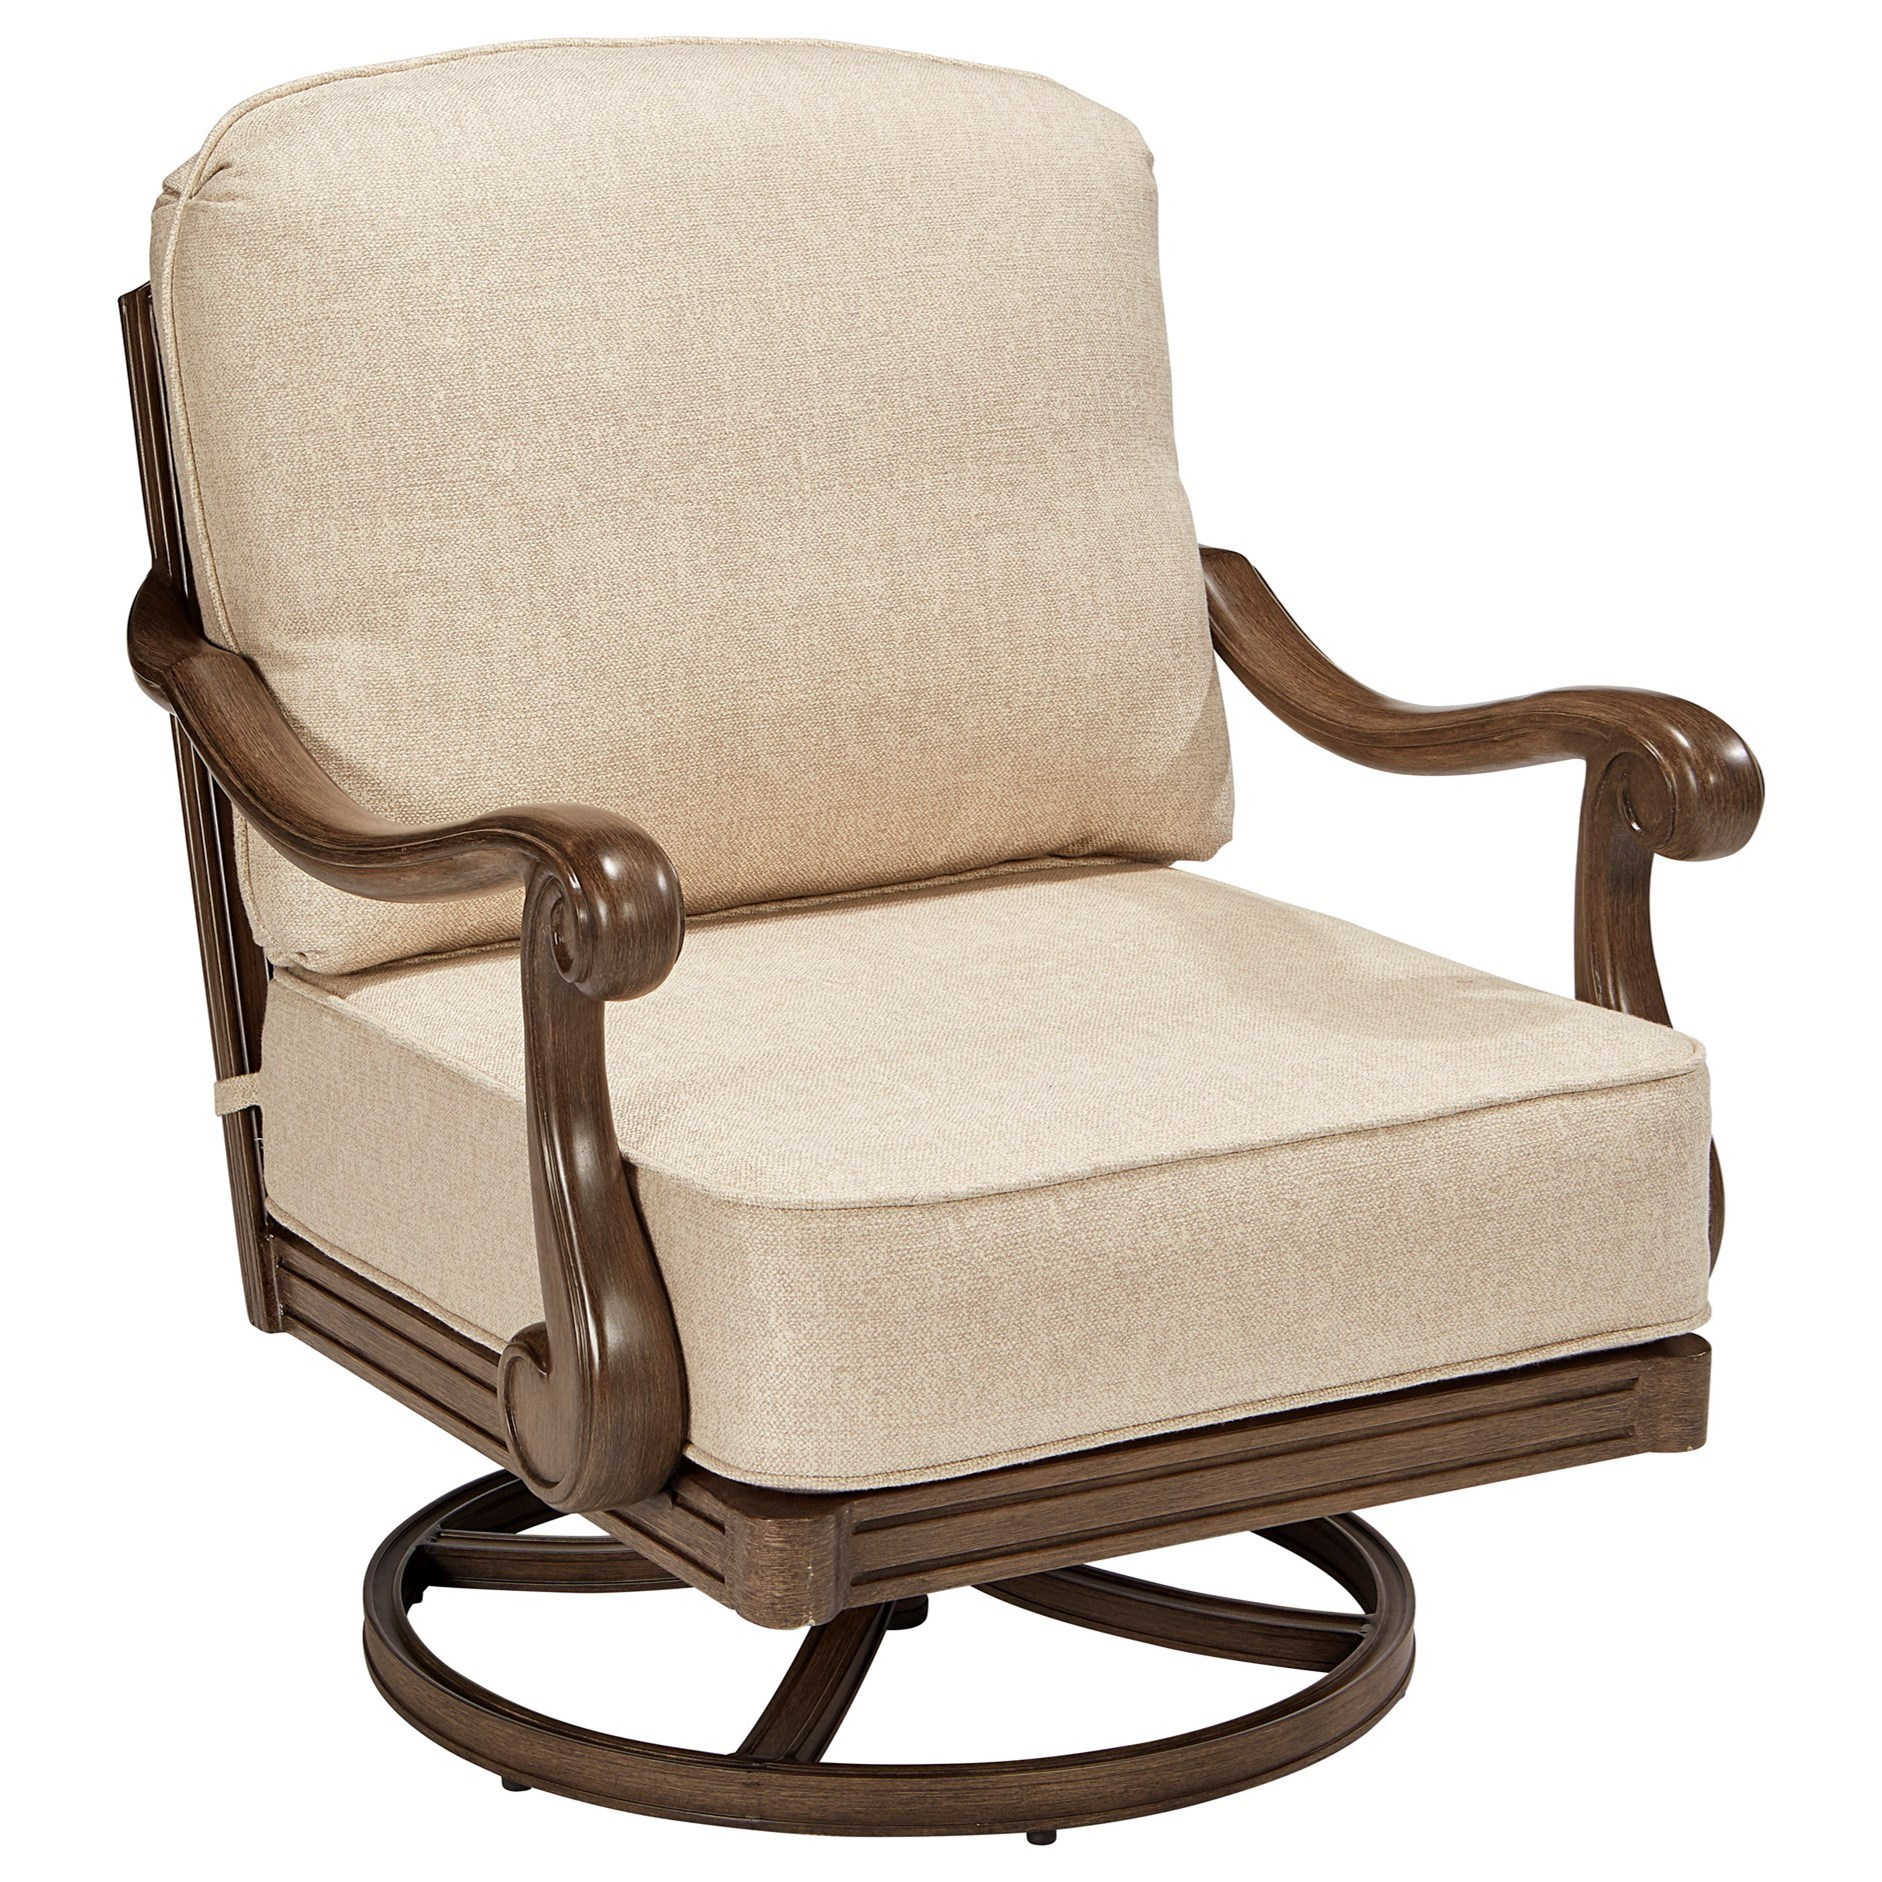 Cannes Swivel Rocking Club Chair